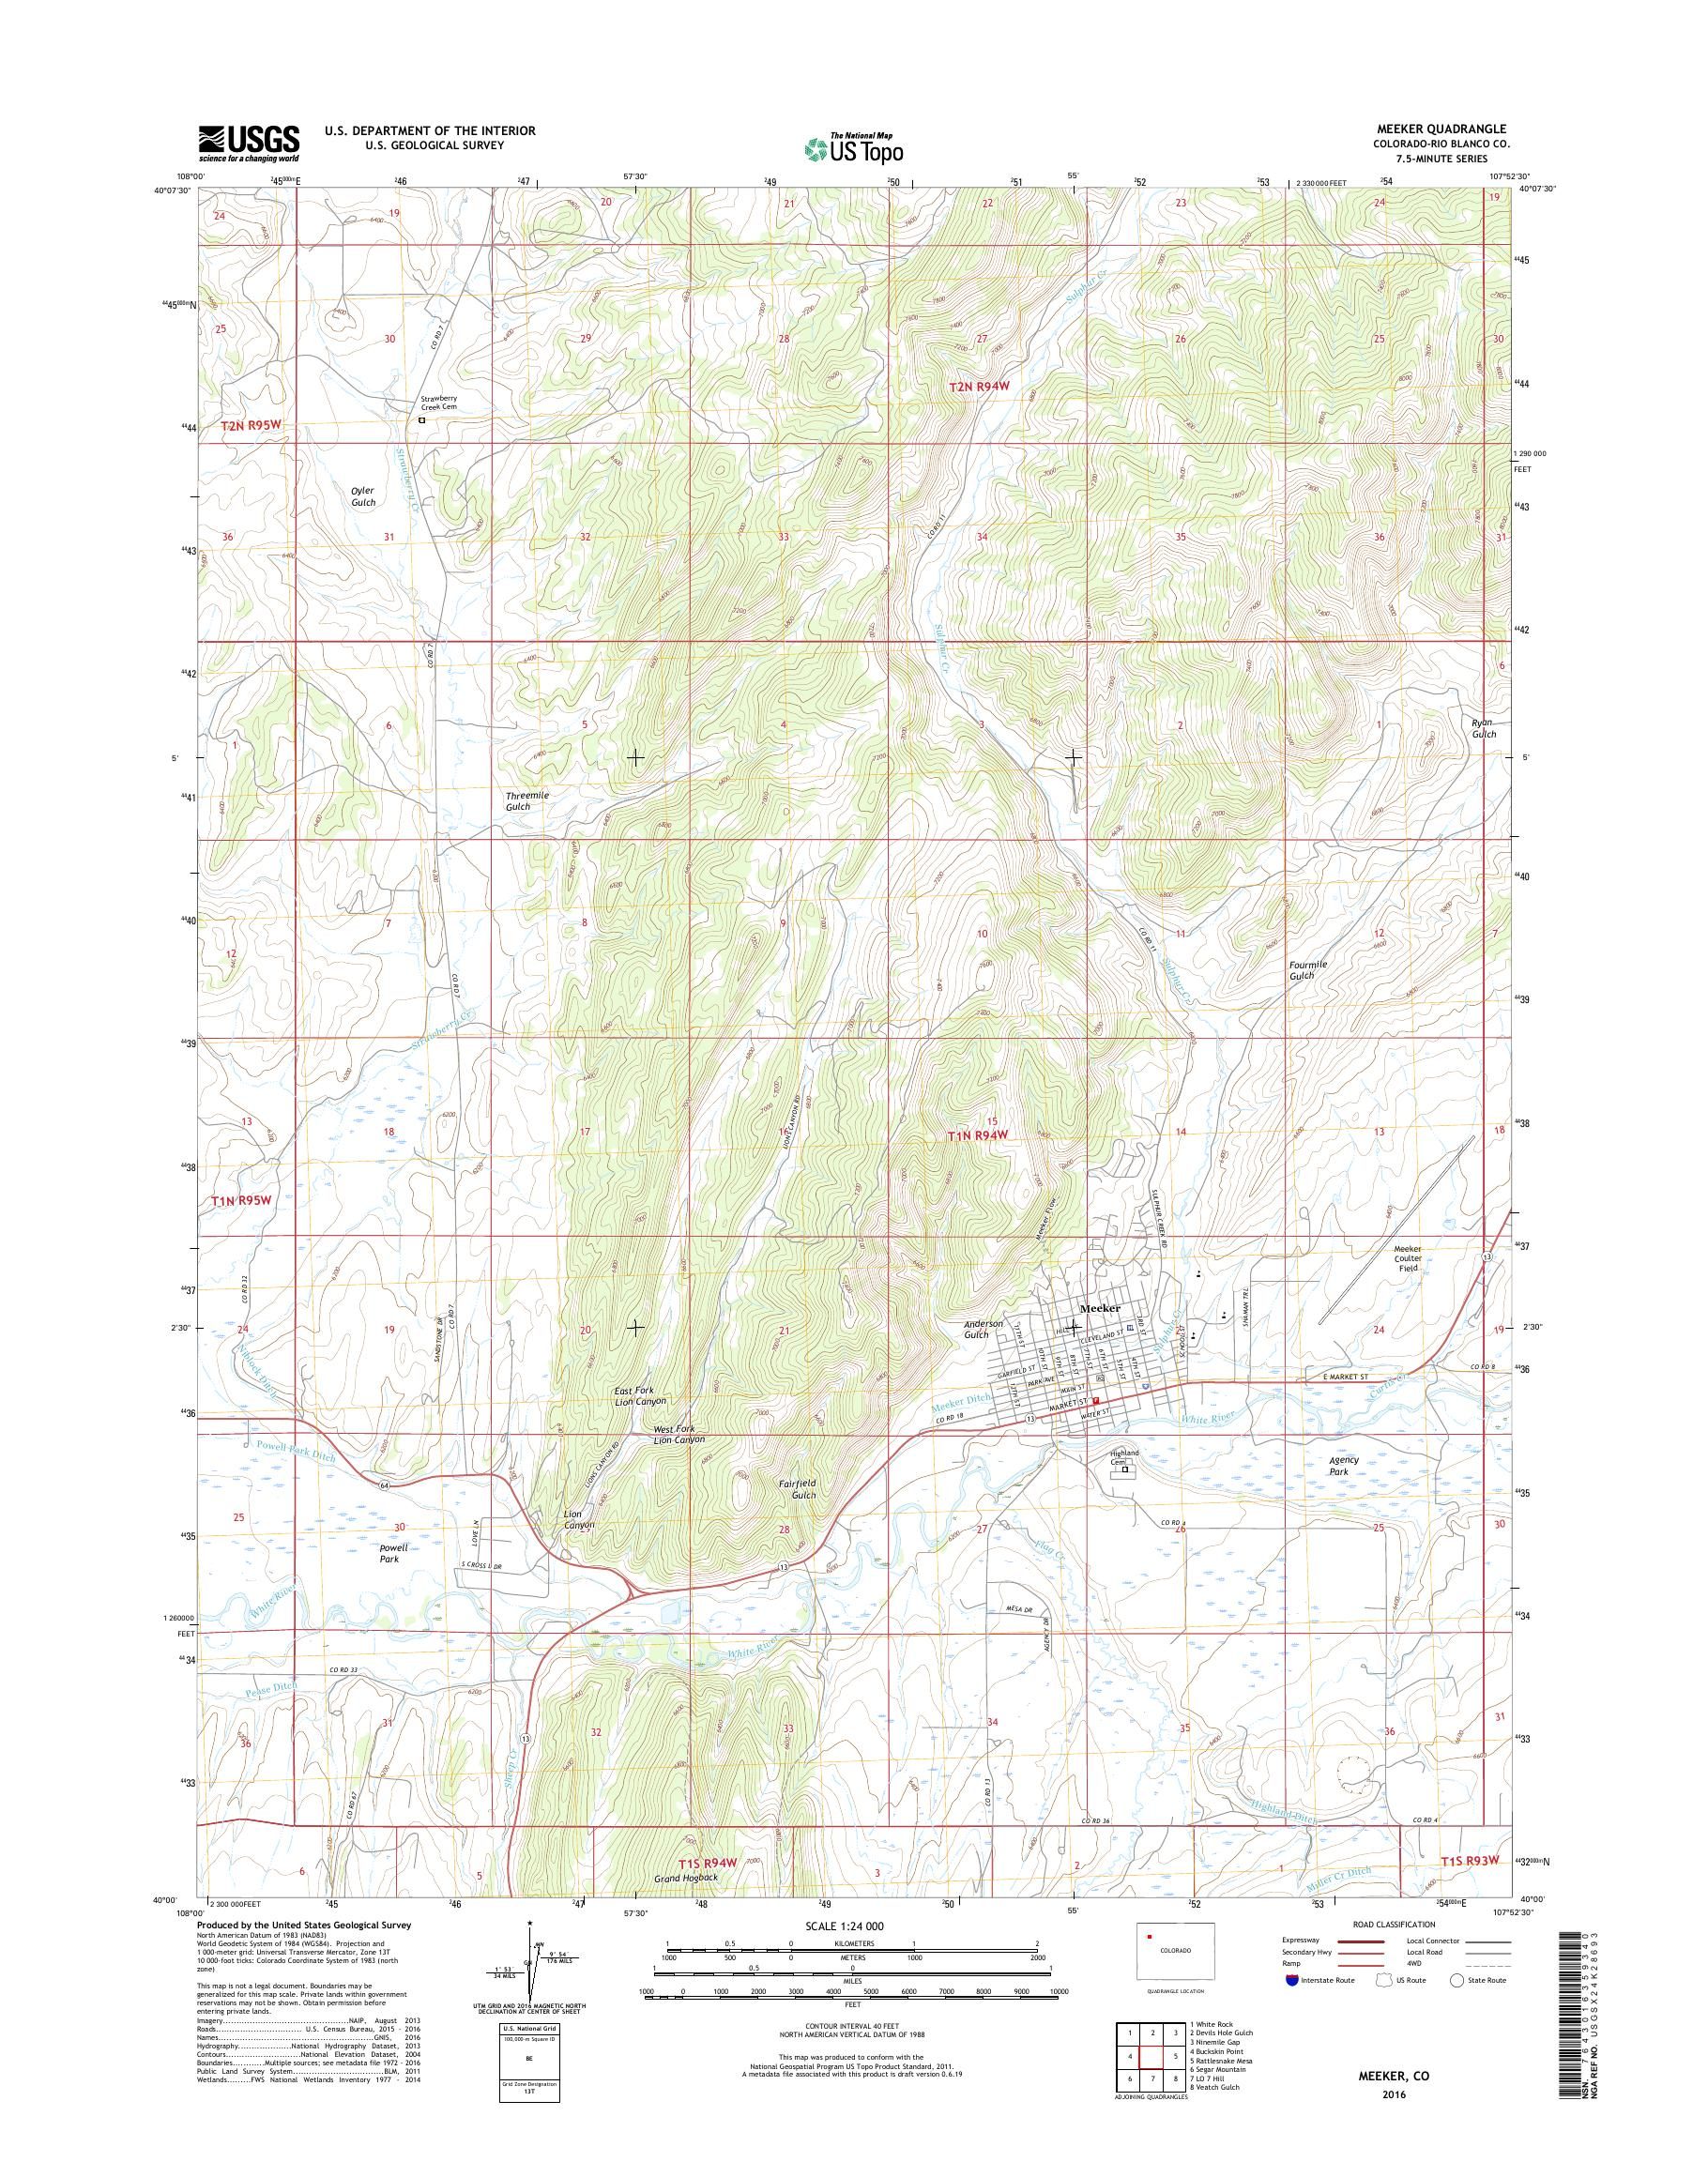 Mytopo Meeker Colorado Usgs Quad Topo Map